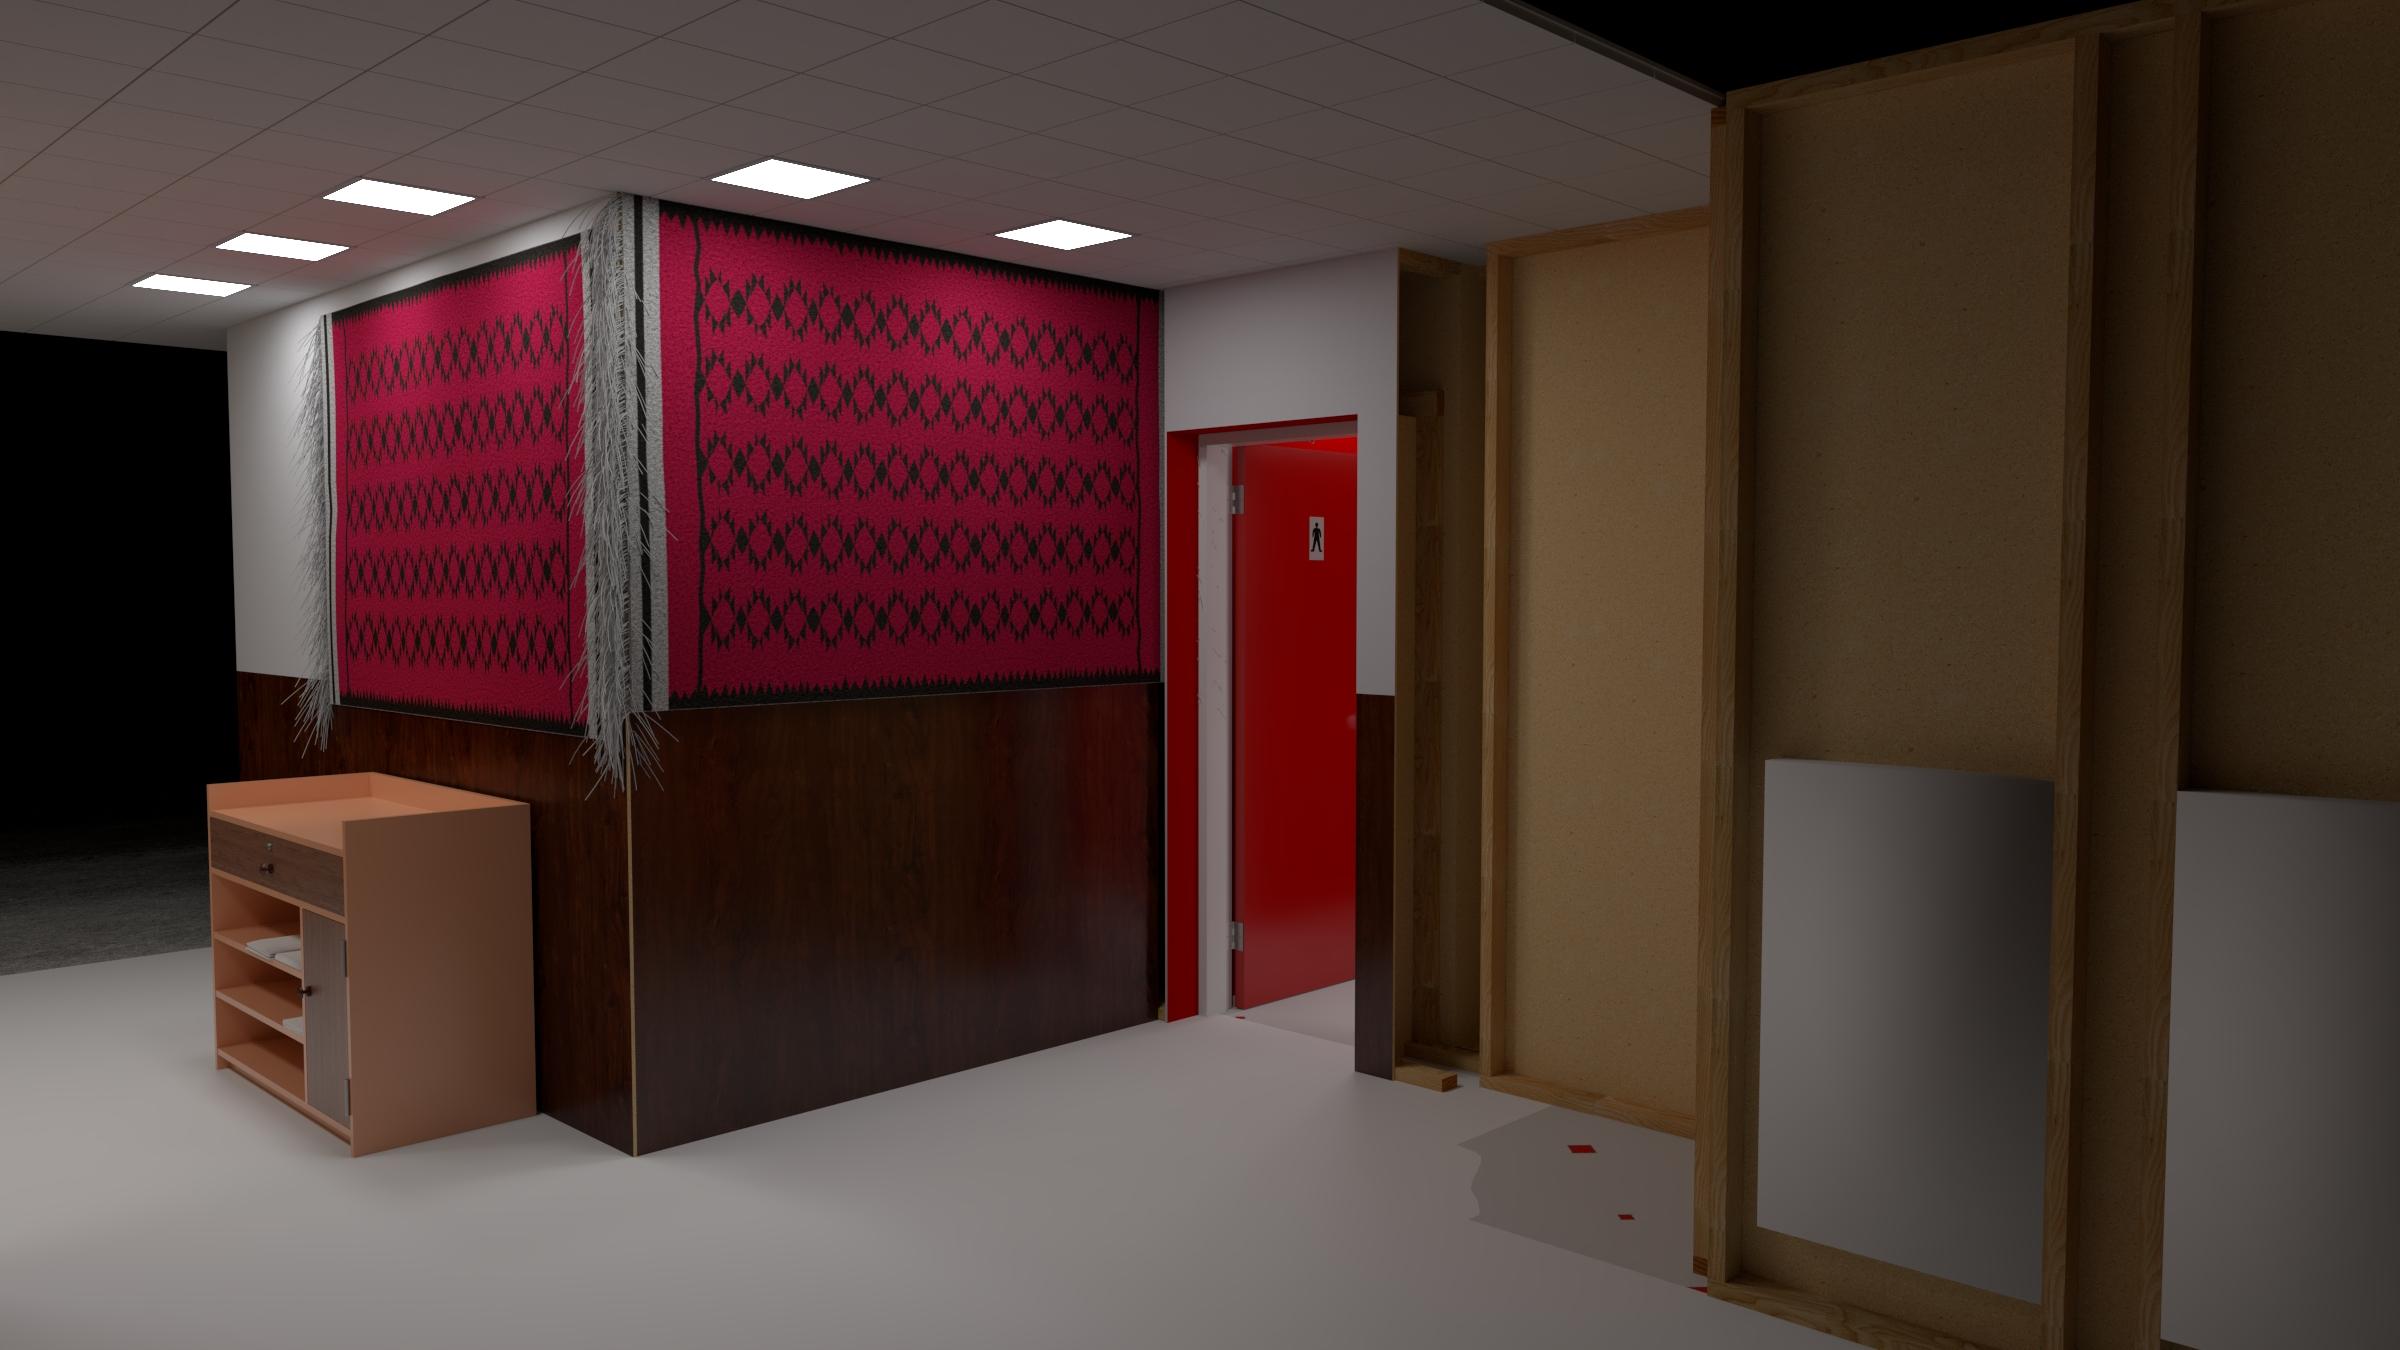 alternative corridor of the red bathroom